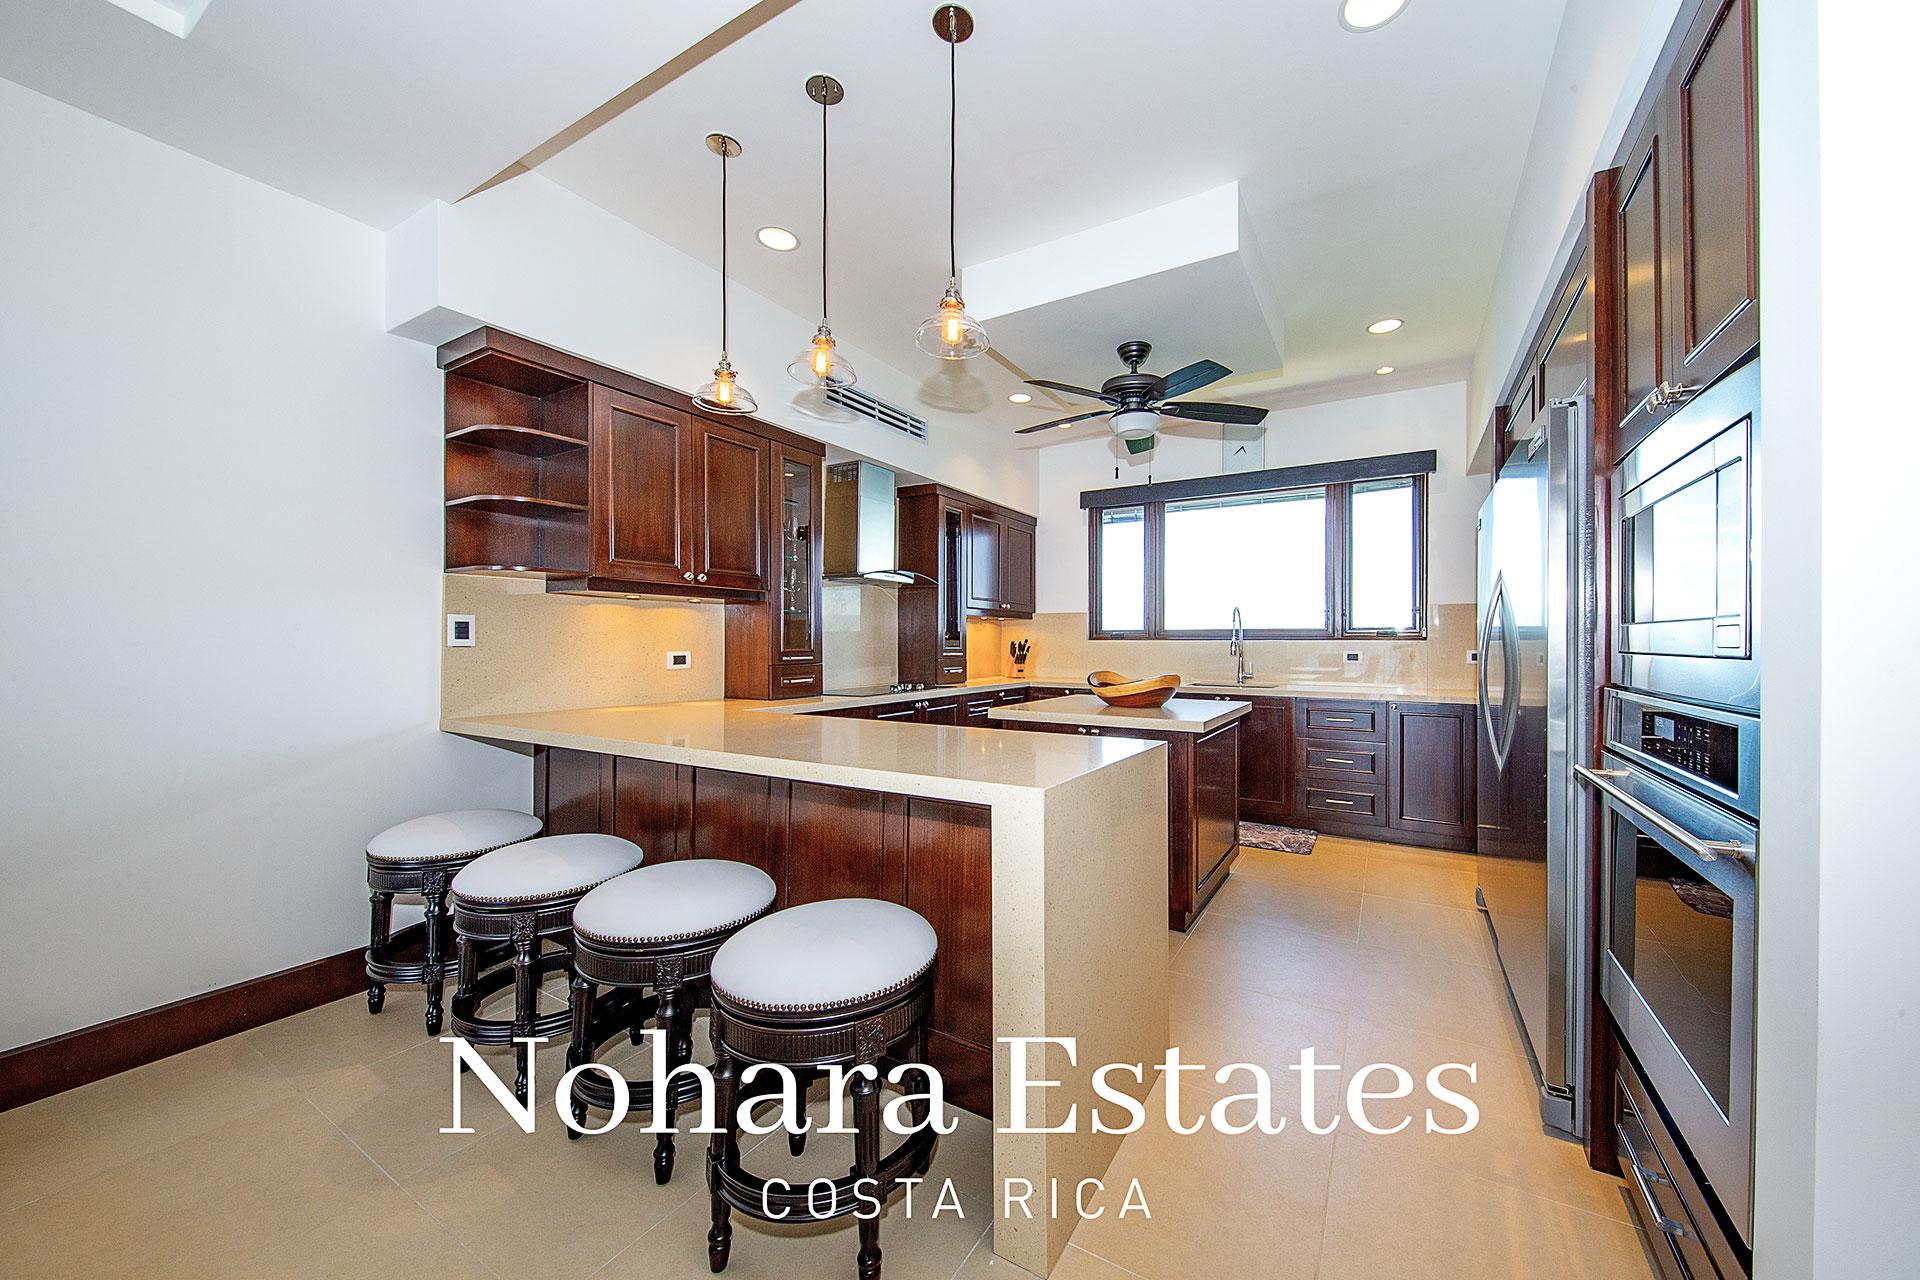 Nohara Estates Costa Rica 360 Esplendor Del Pacifico 13